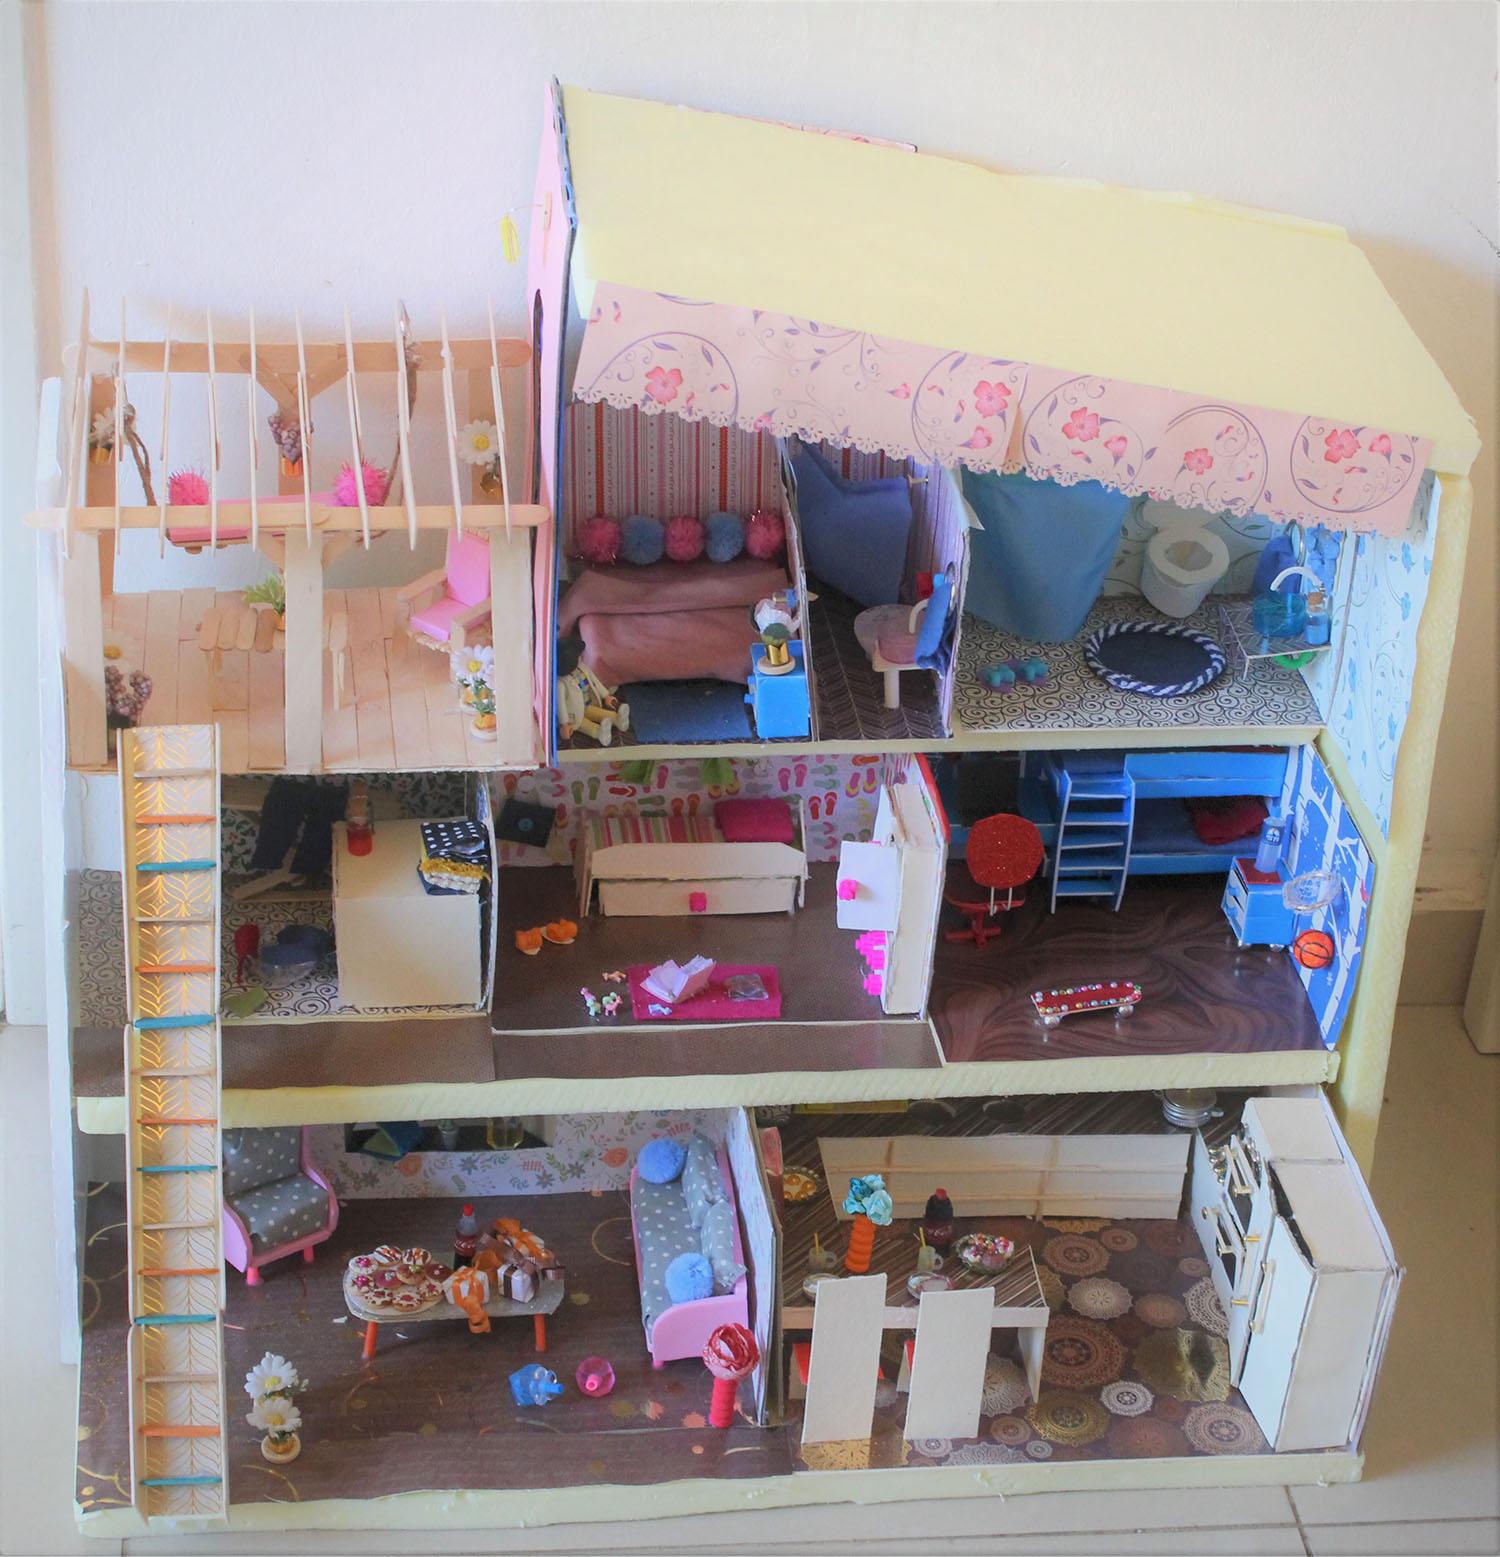 IMG 5959 - מיניאטורות: סיימנו את הבית